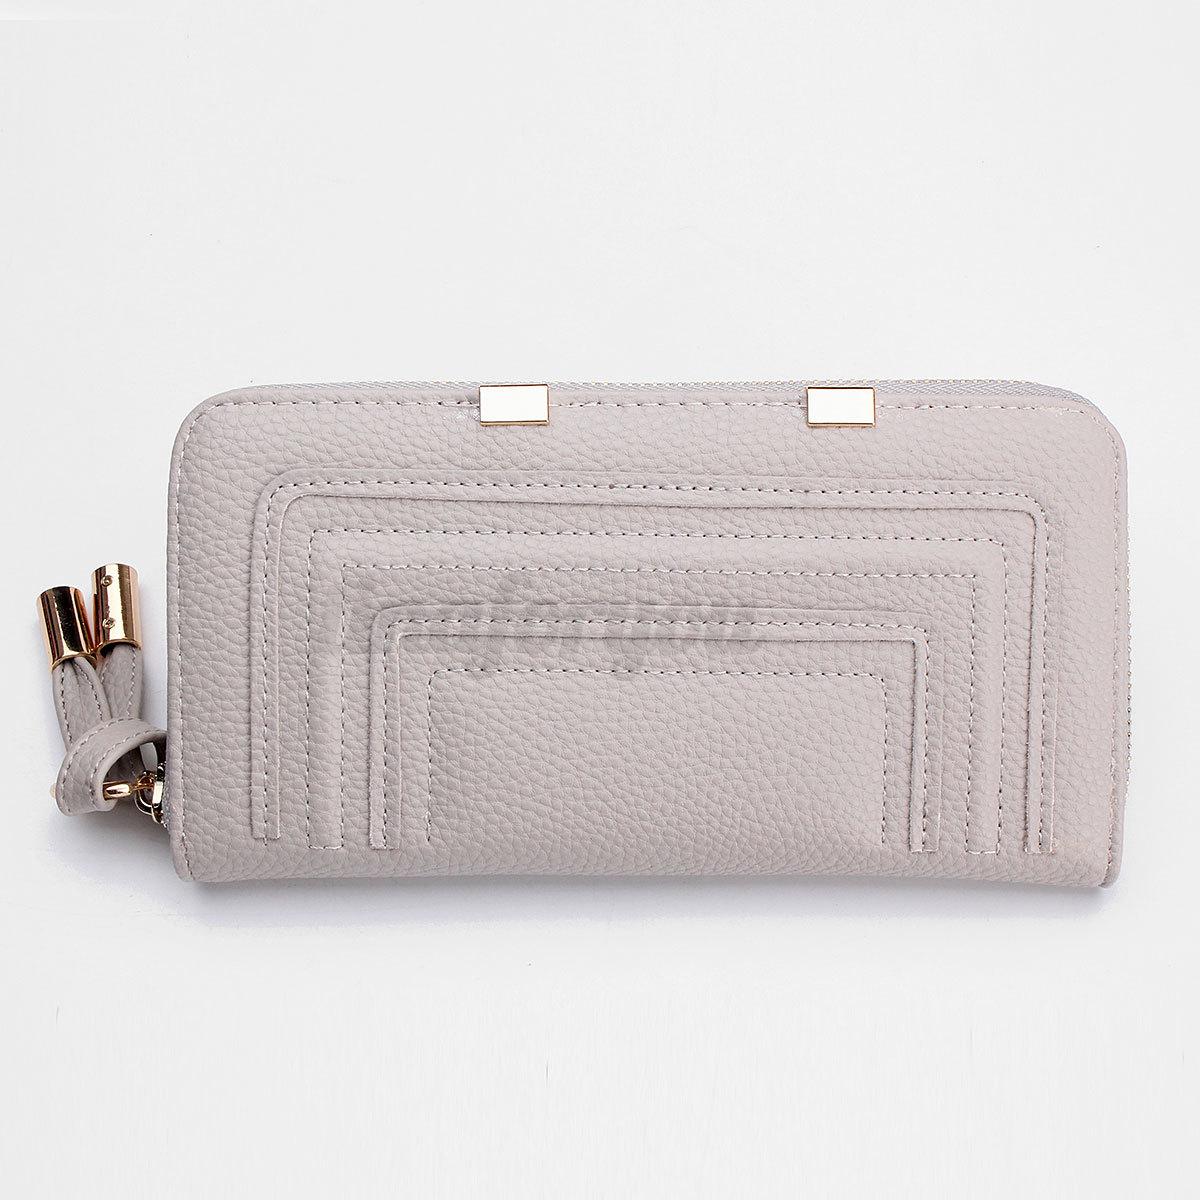 Fashion Women Clutch Leather Wallet Long Card Holder Purse Handbag Coin bag NEW